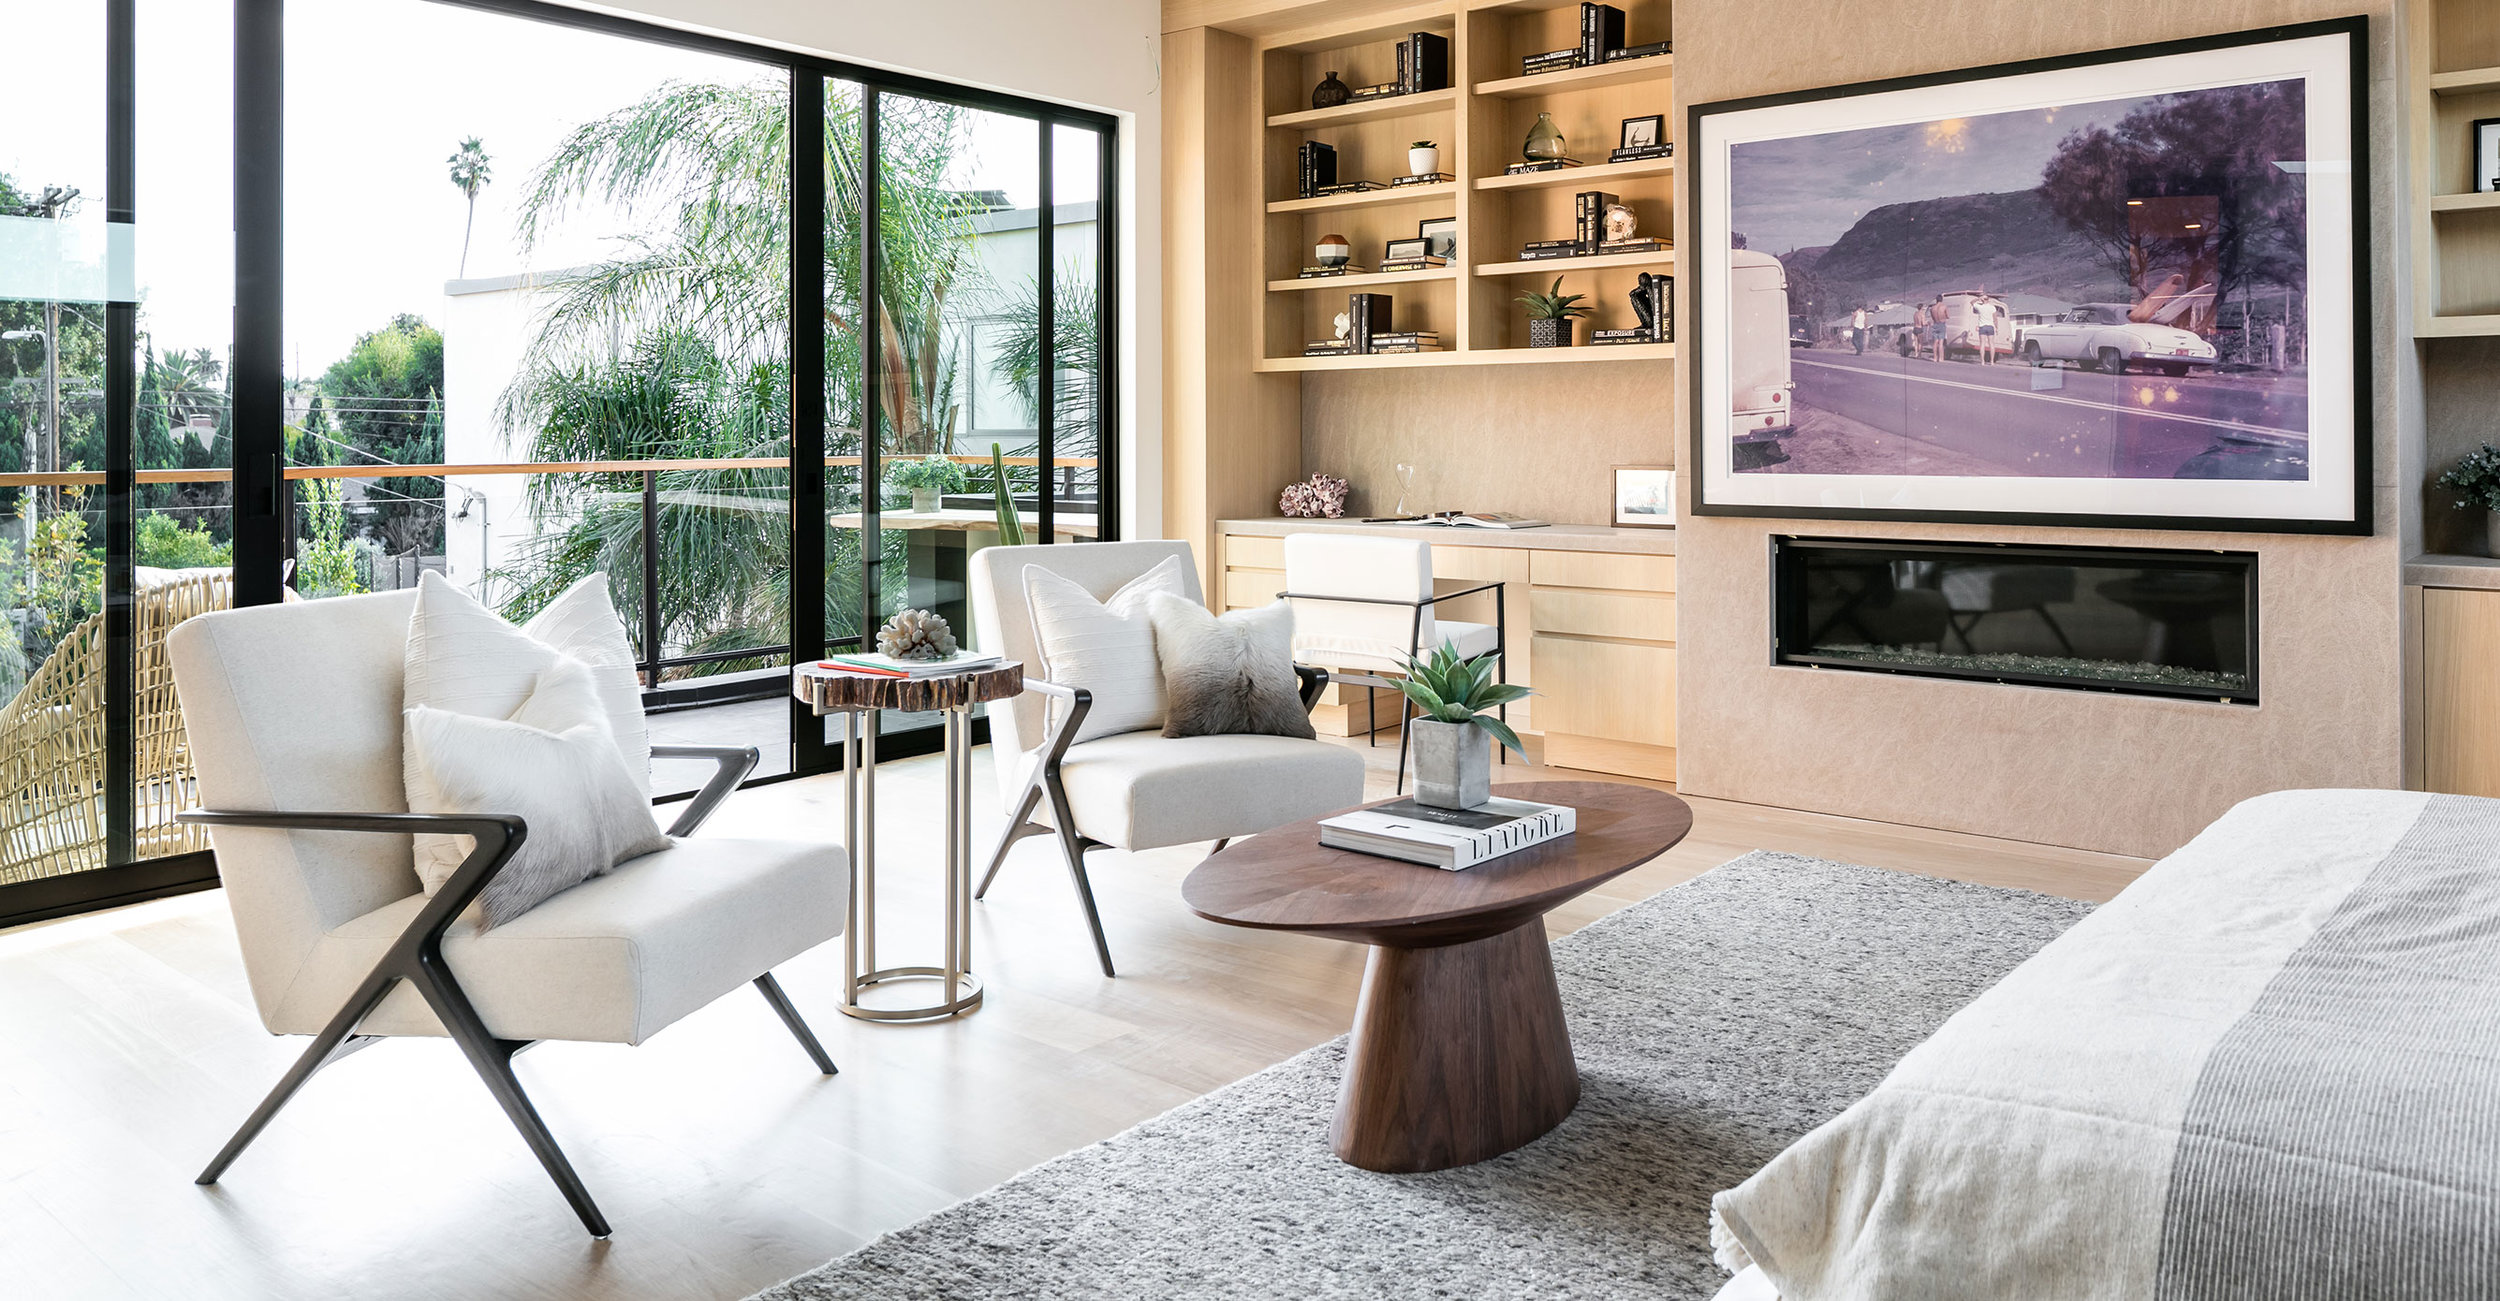 9-Master-bedroom-modern-outdoor-living-LosAngeles-Silicon-Bay.jpg